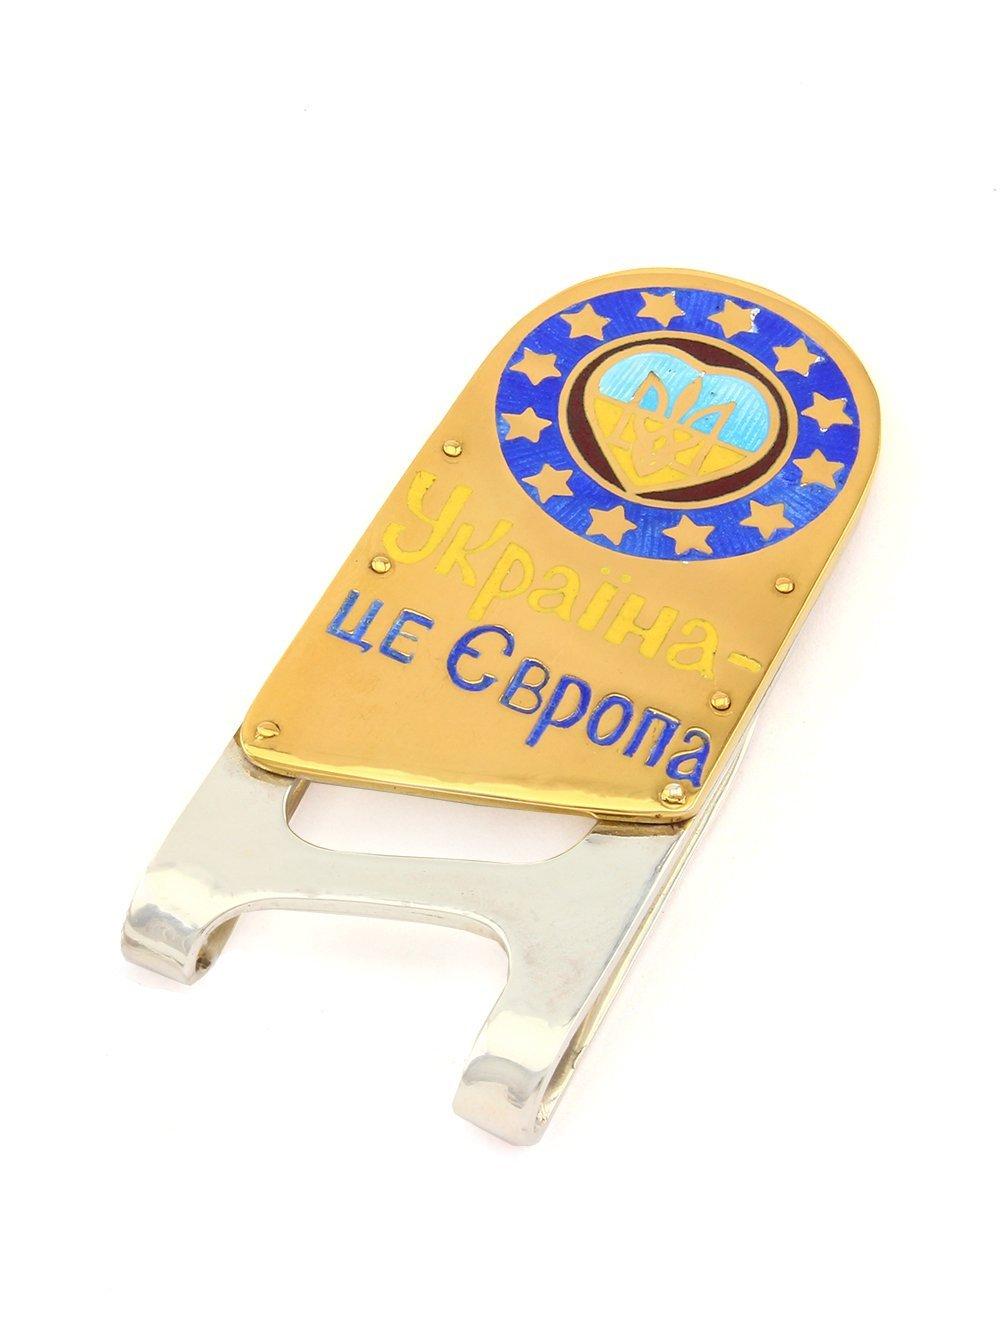 Silver Banknote clip Money clip ''Ukraine is Europe''